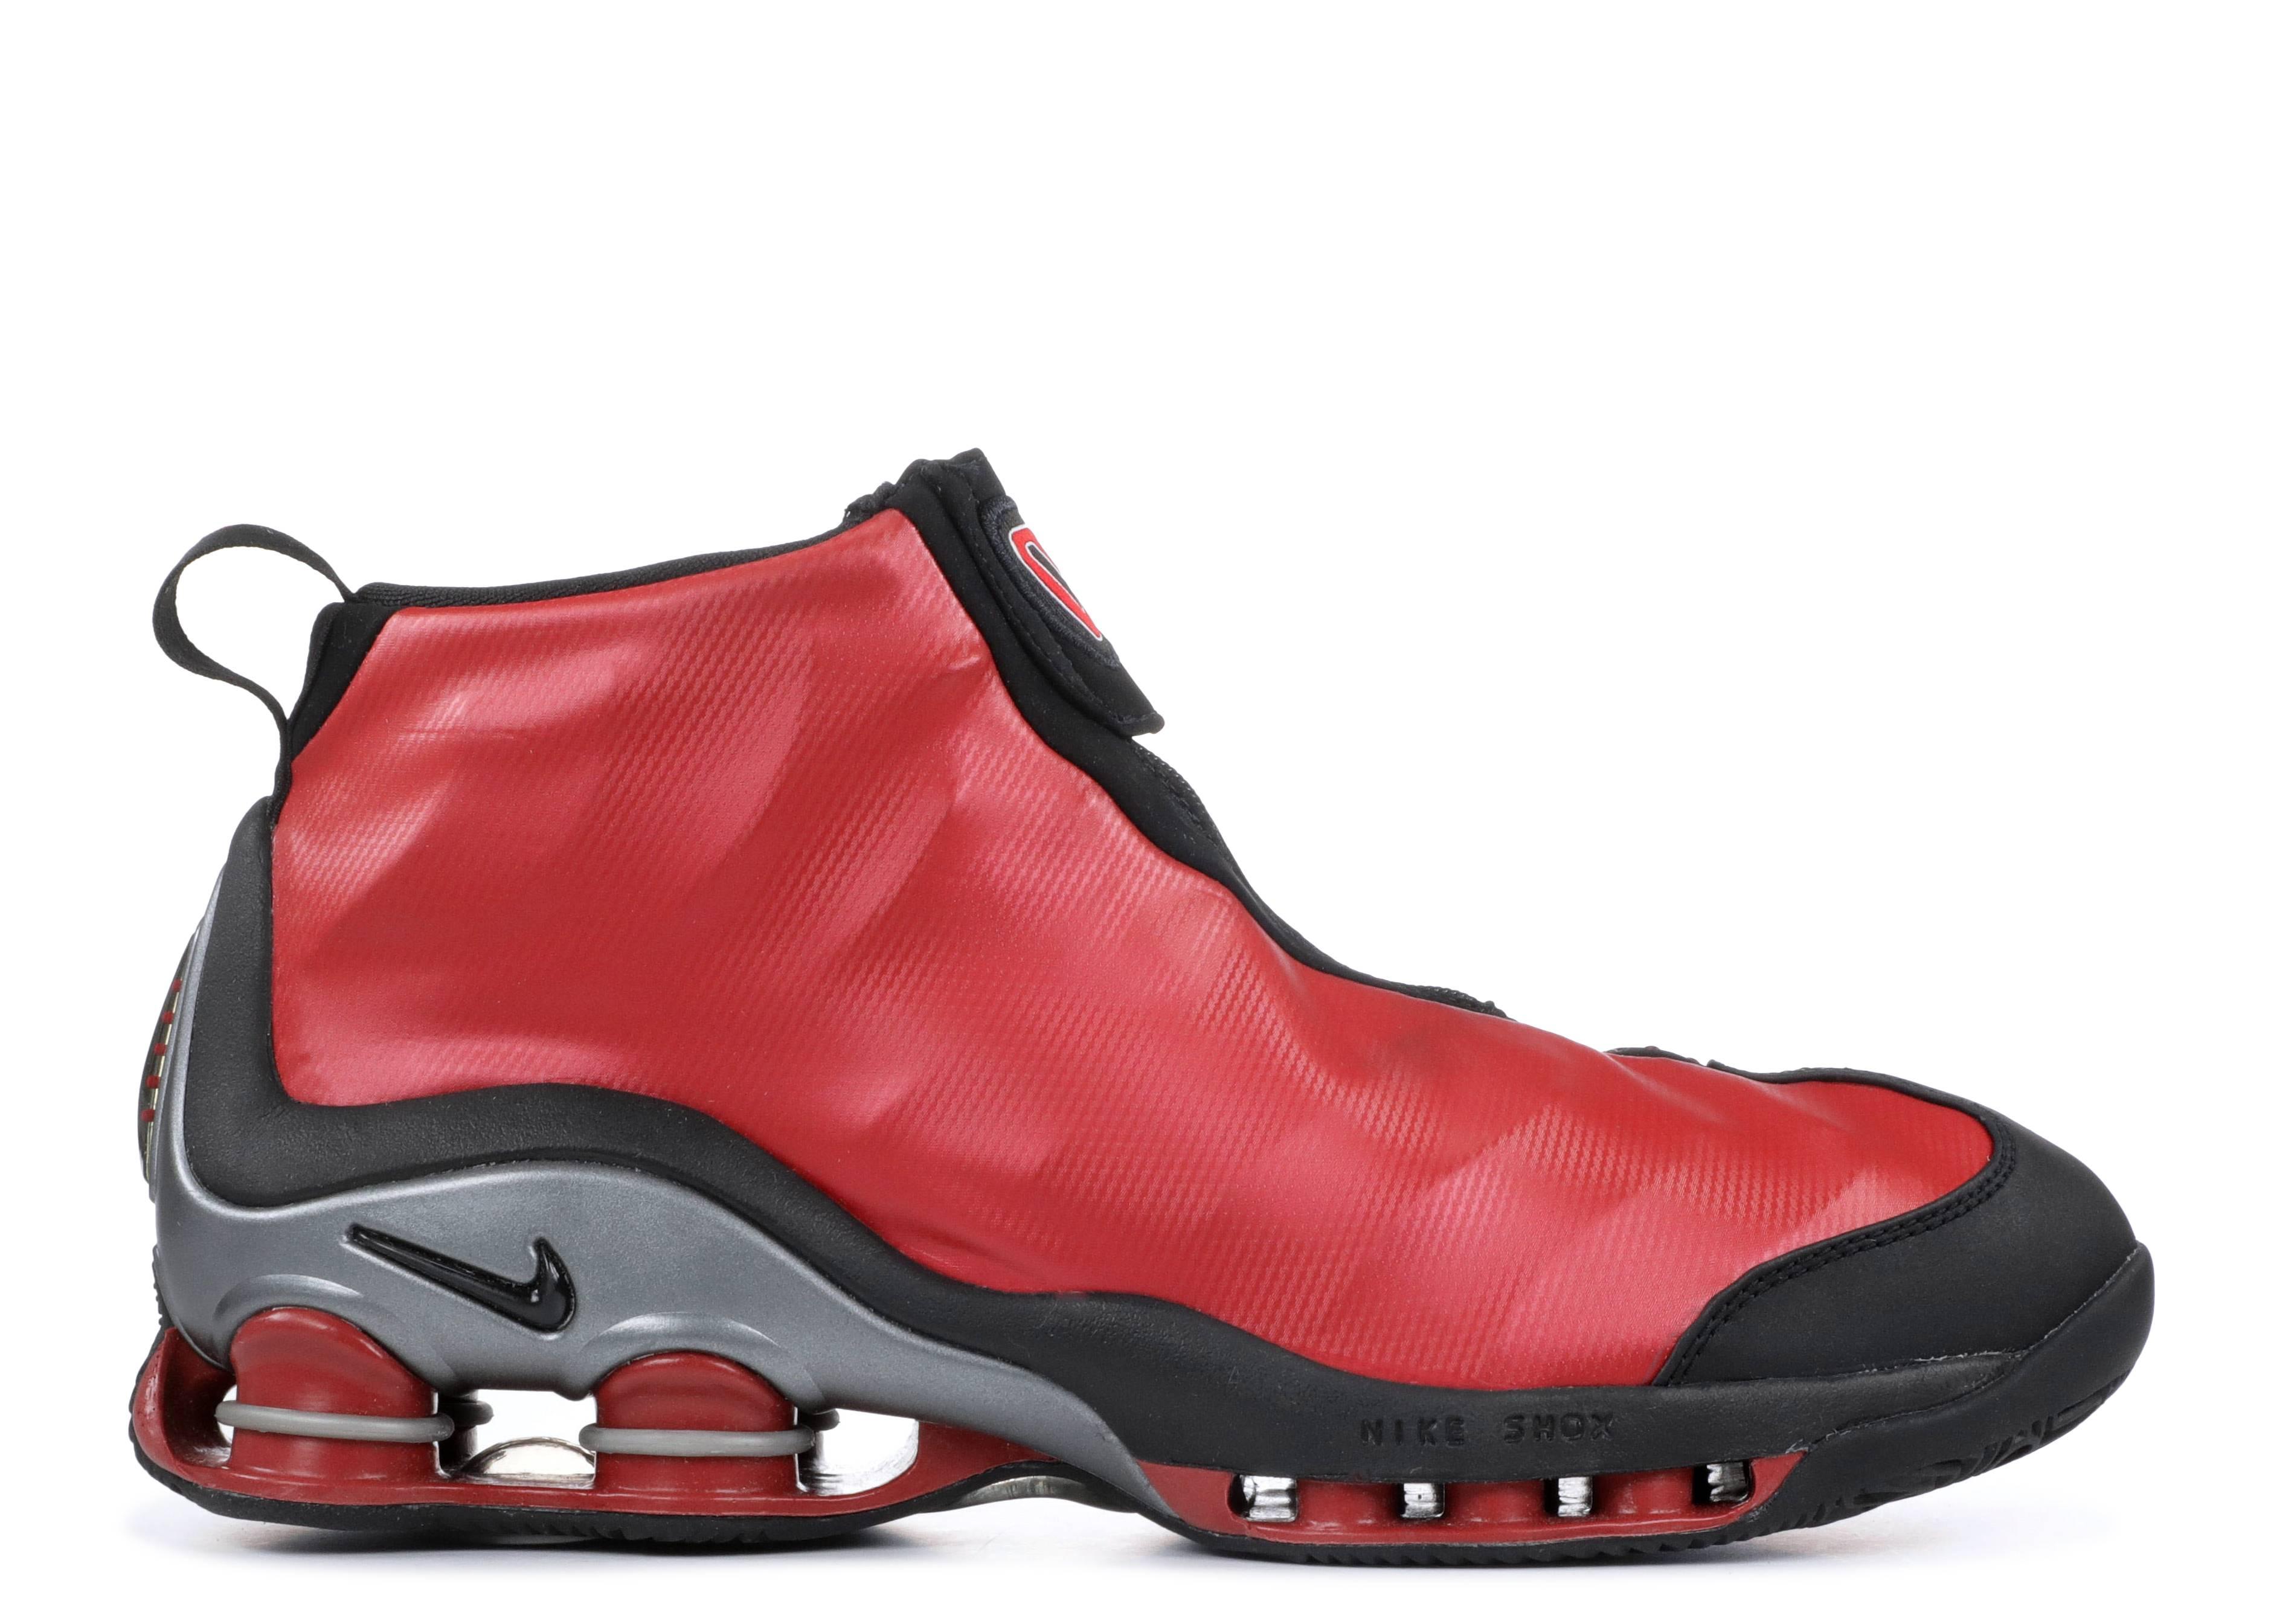 b4b85aa80c94 Nike Shox Vc - Nike - 302277 601 - varsity red black- met silver ...